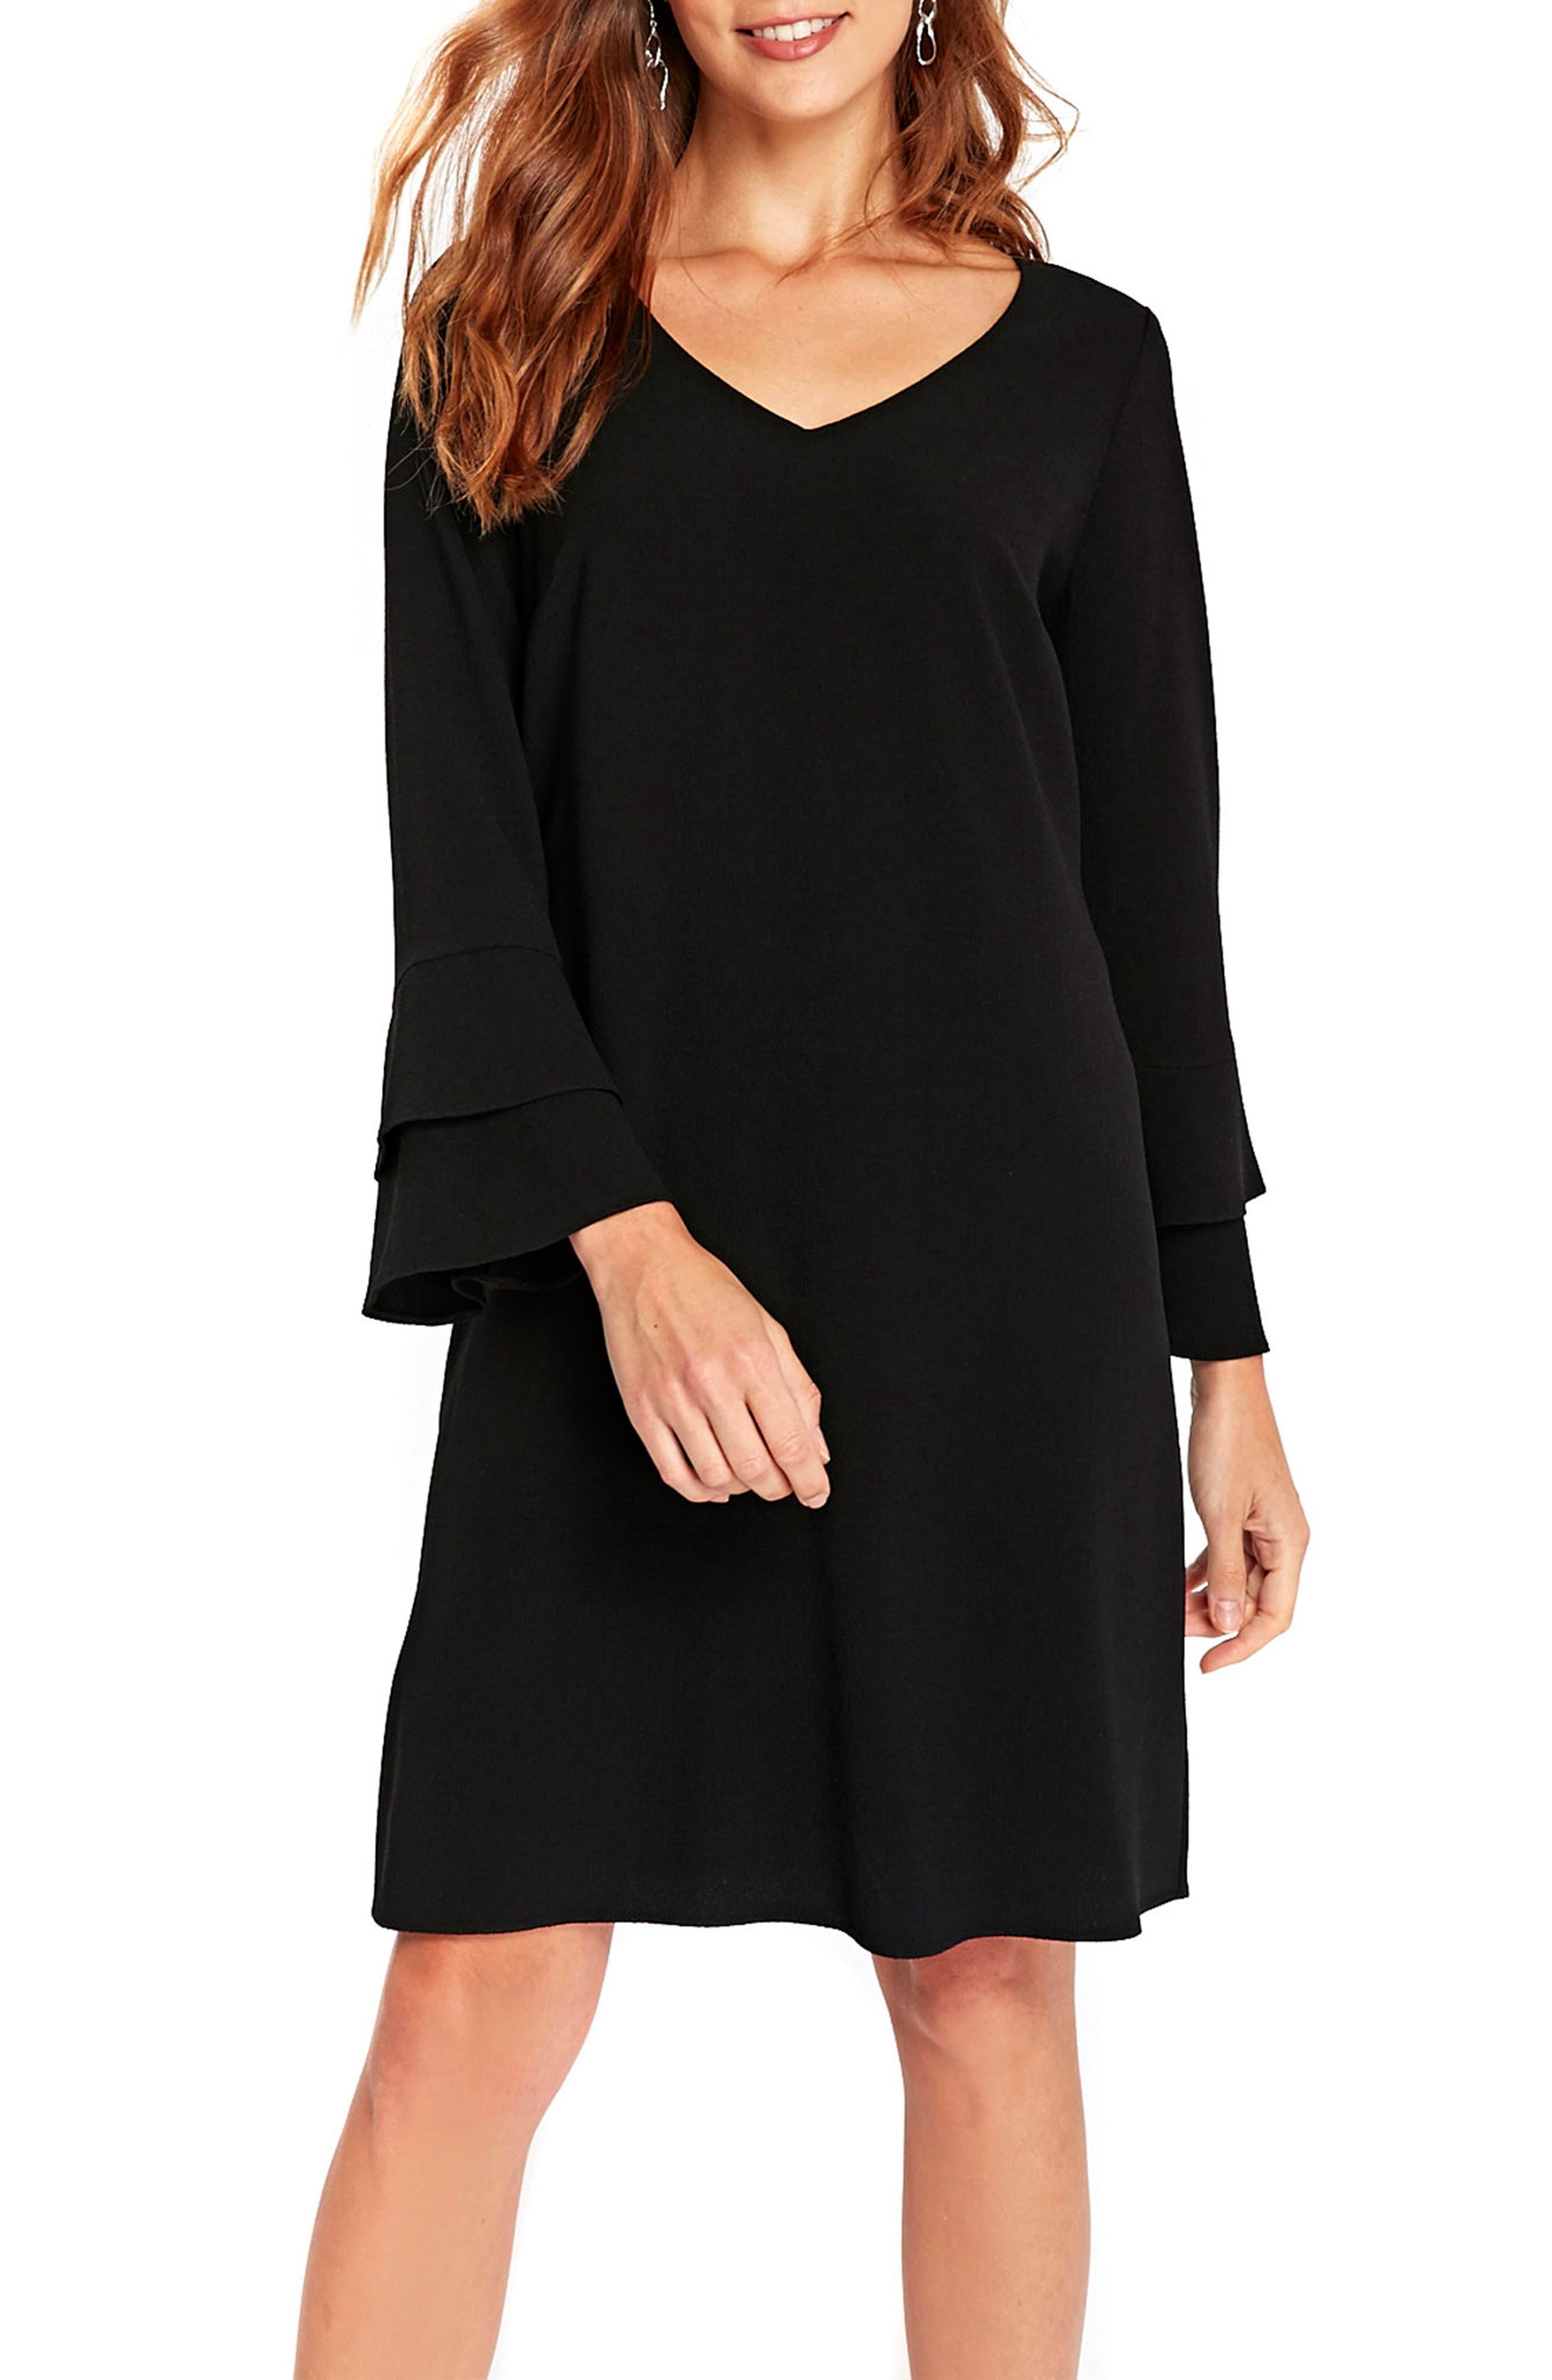 Main Image - Wallis Bell Sleeve Shift Dress